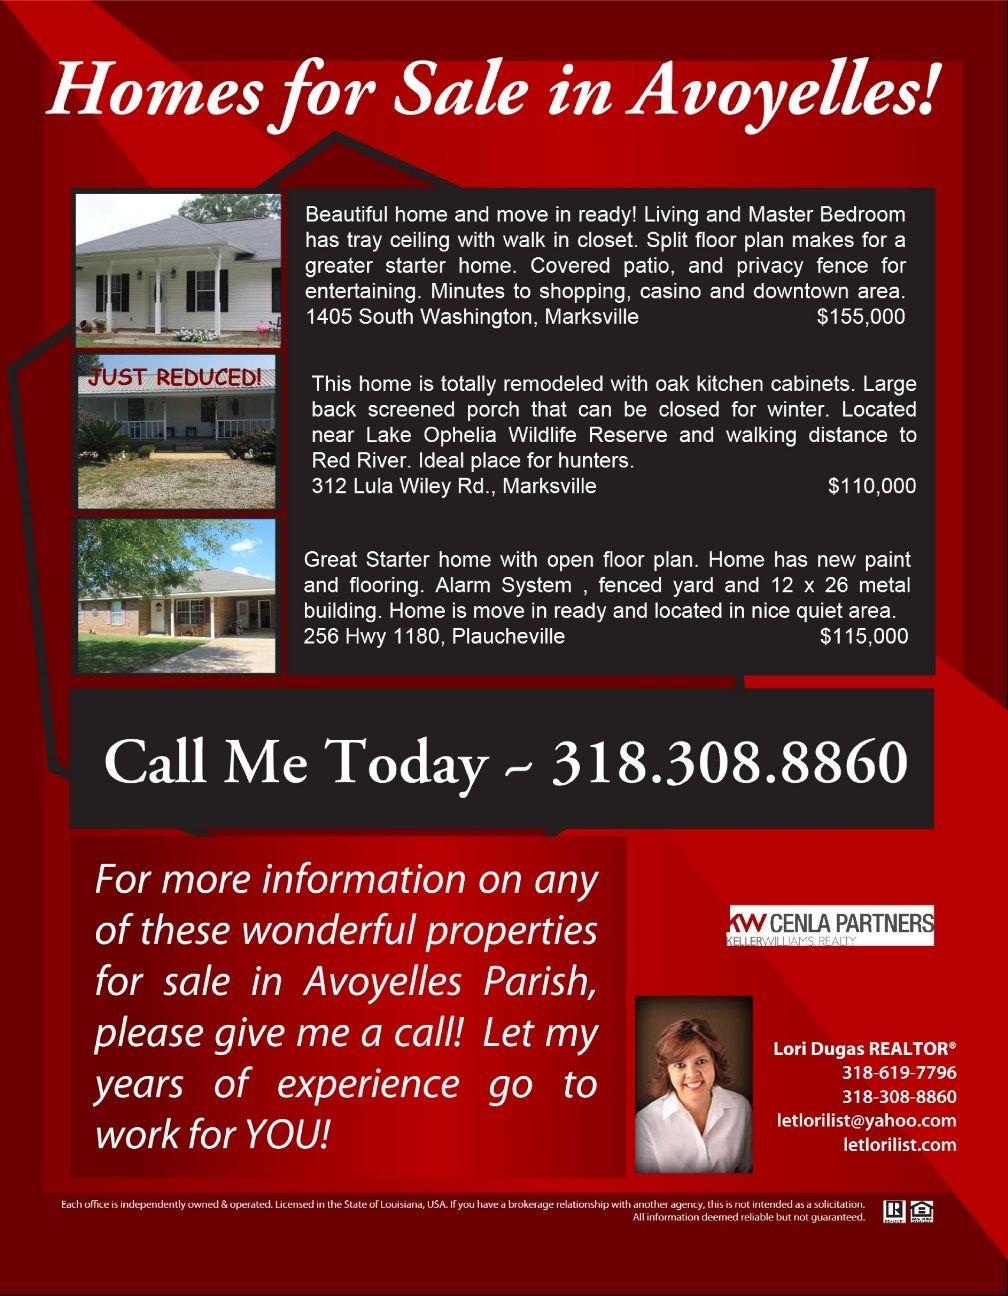 Homes For Sale In Avoyelles Parish Jackson St Avoyelles Parish Keller Williams Realty